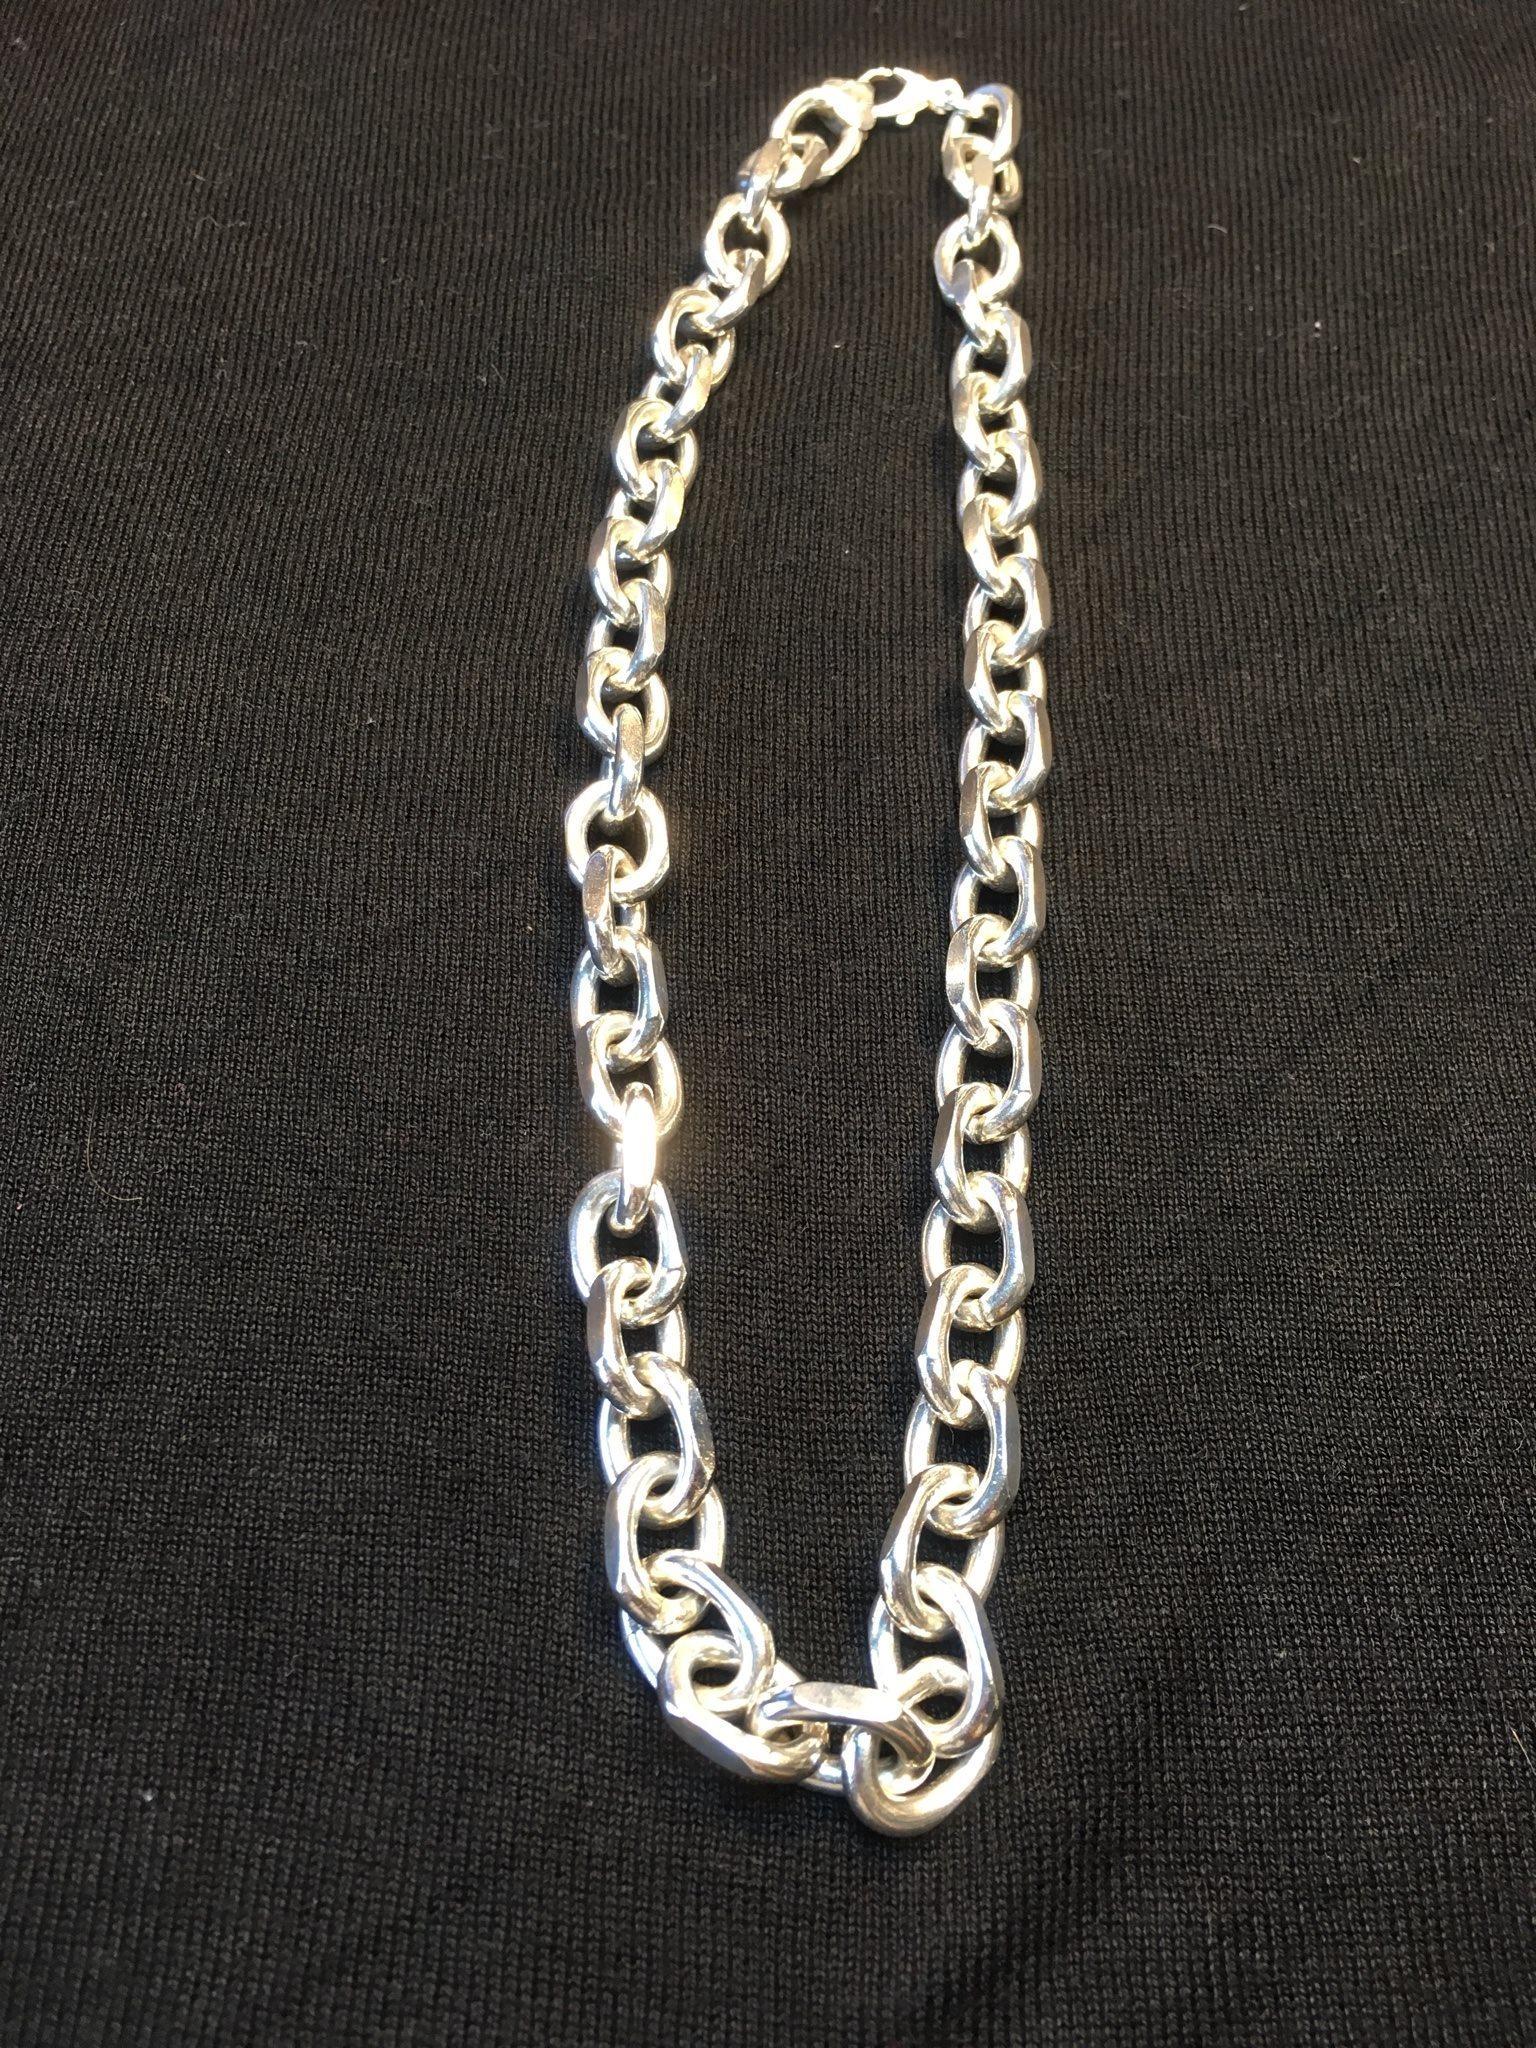 ankarlänk silver halsband